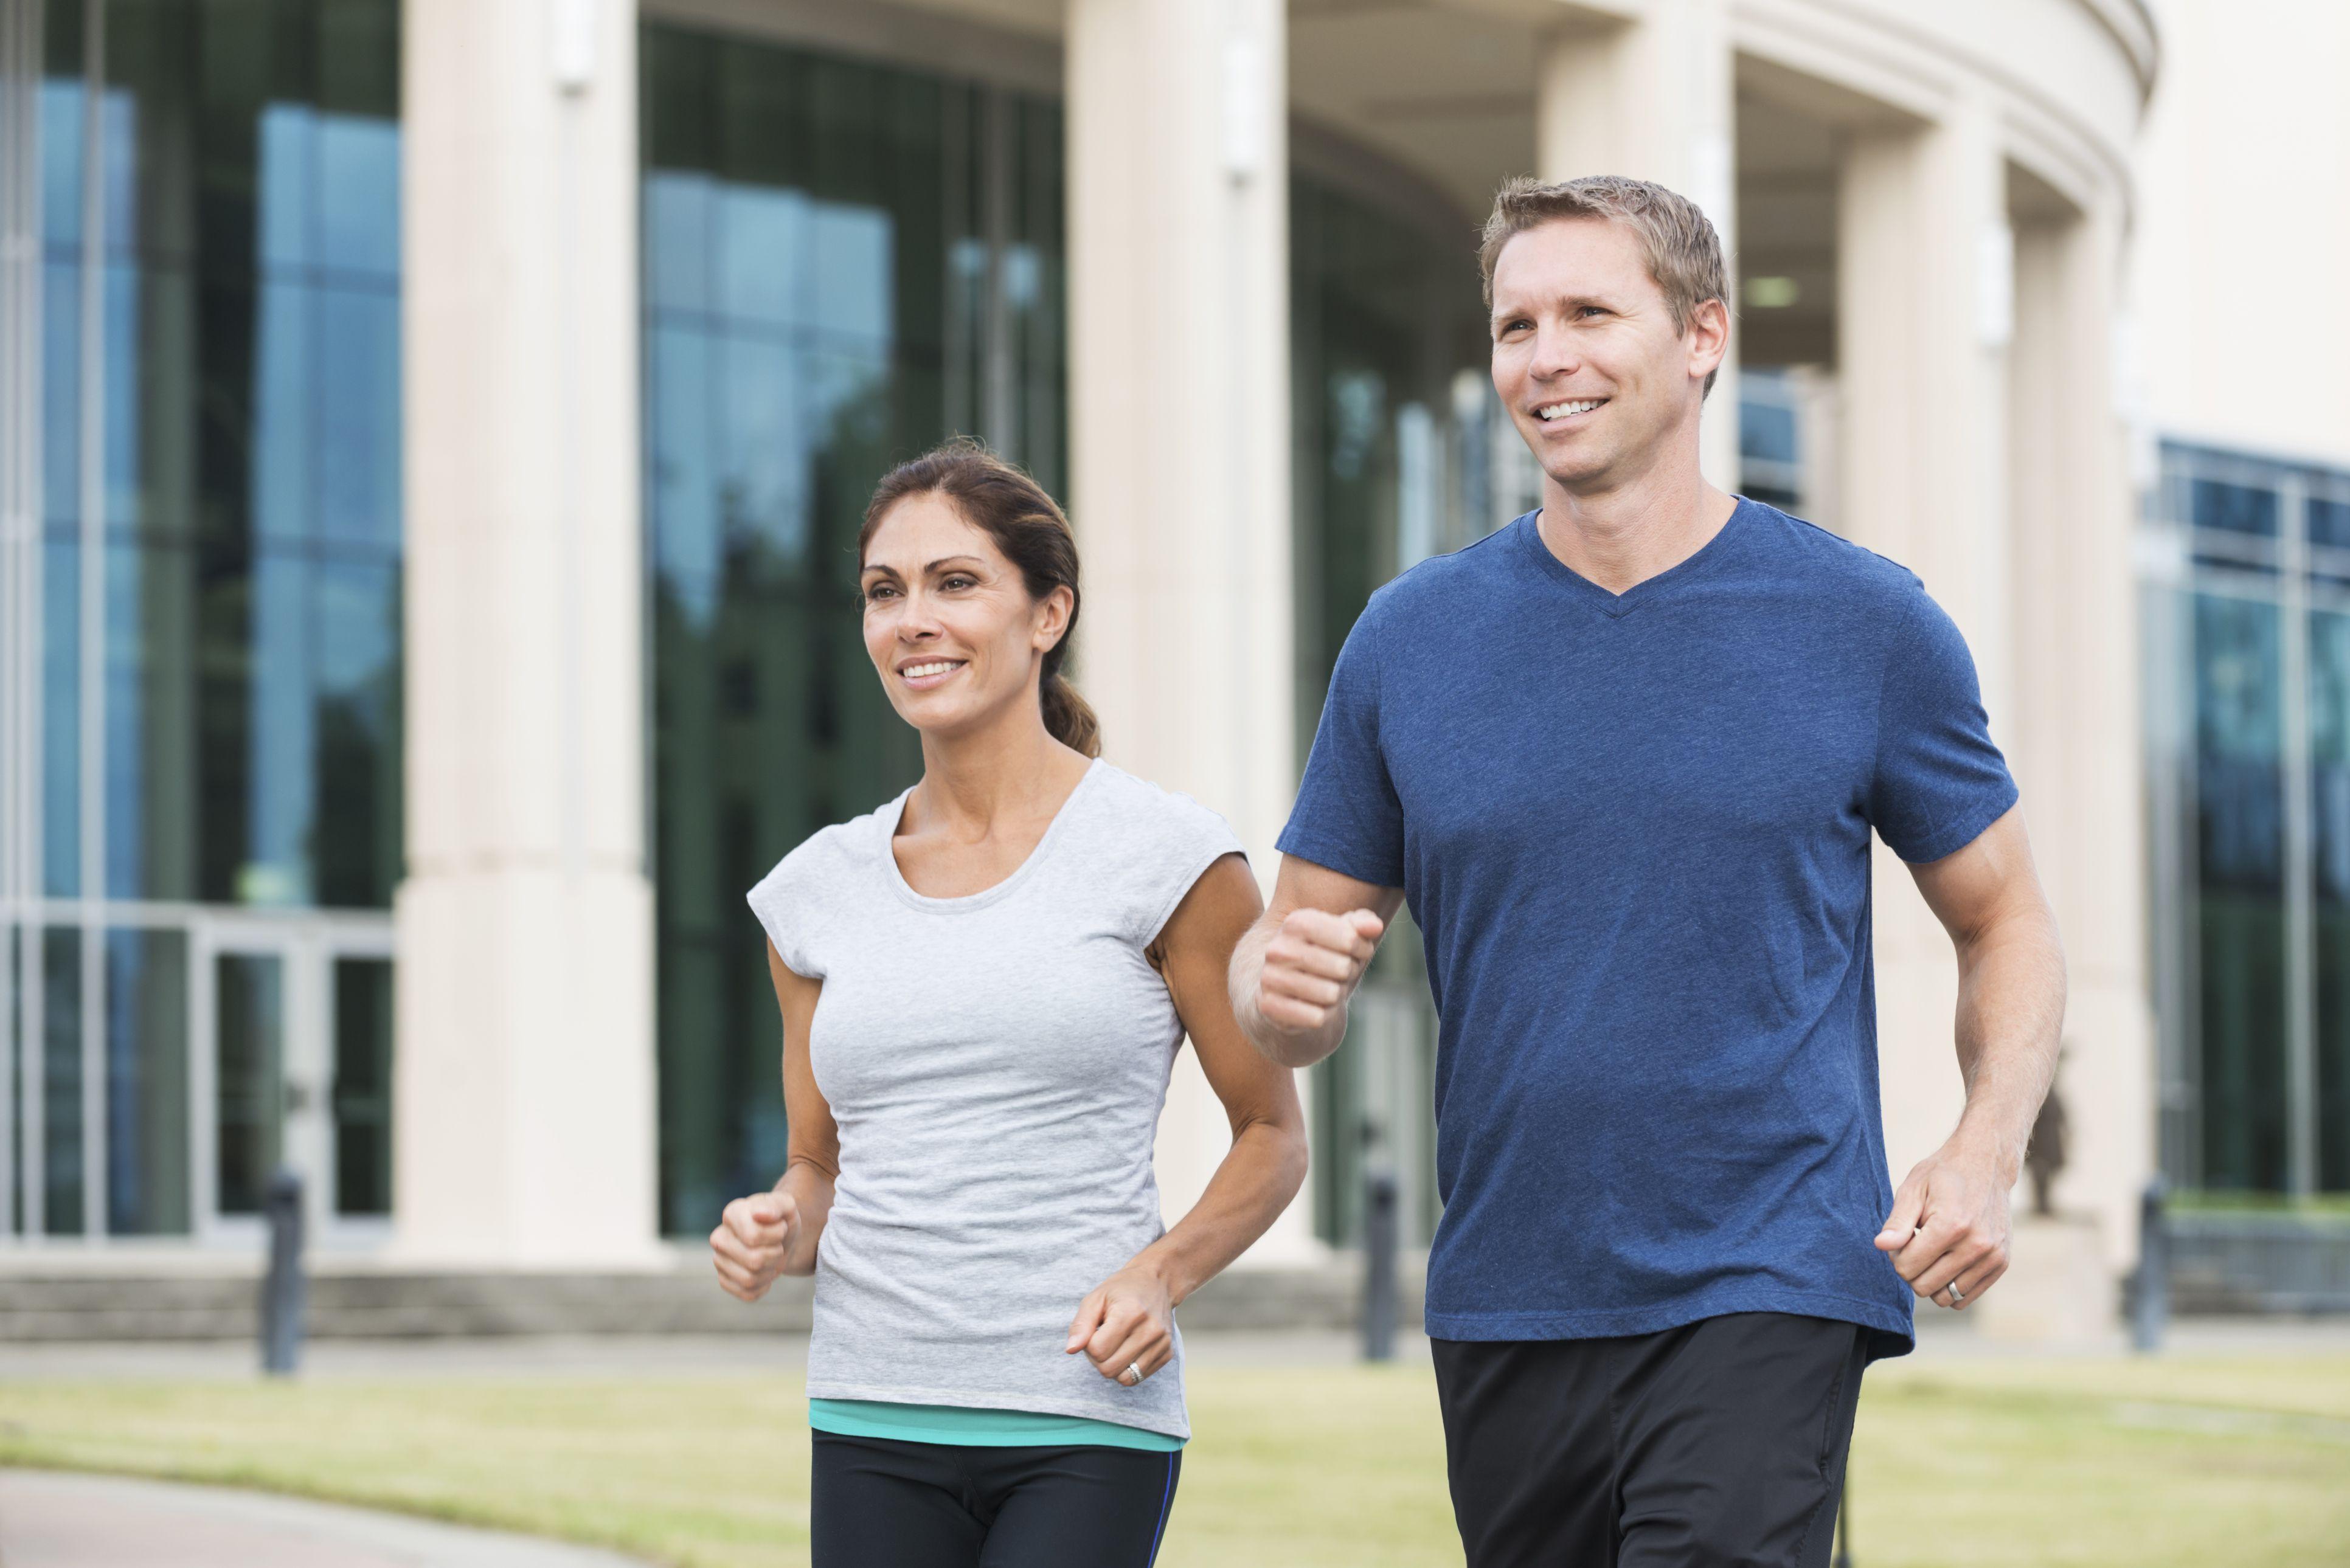 20 Minute Brisk Walking Workout